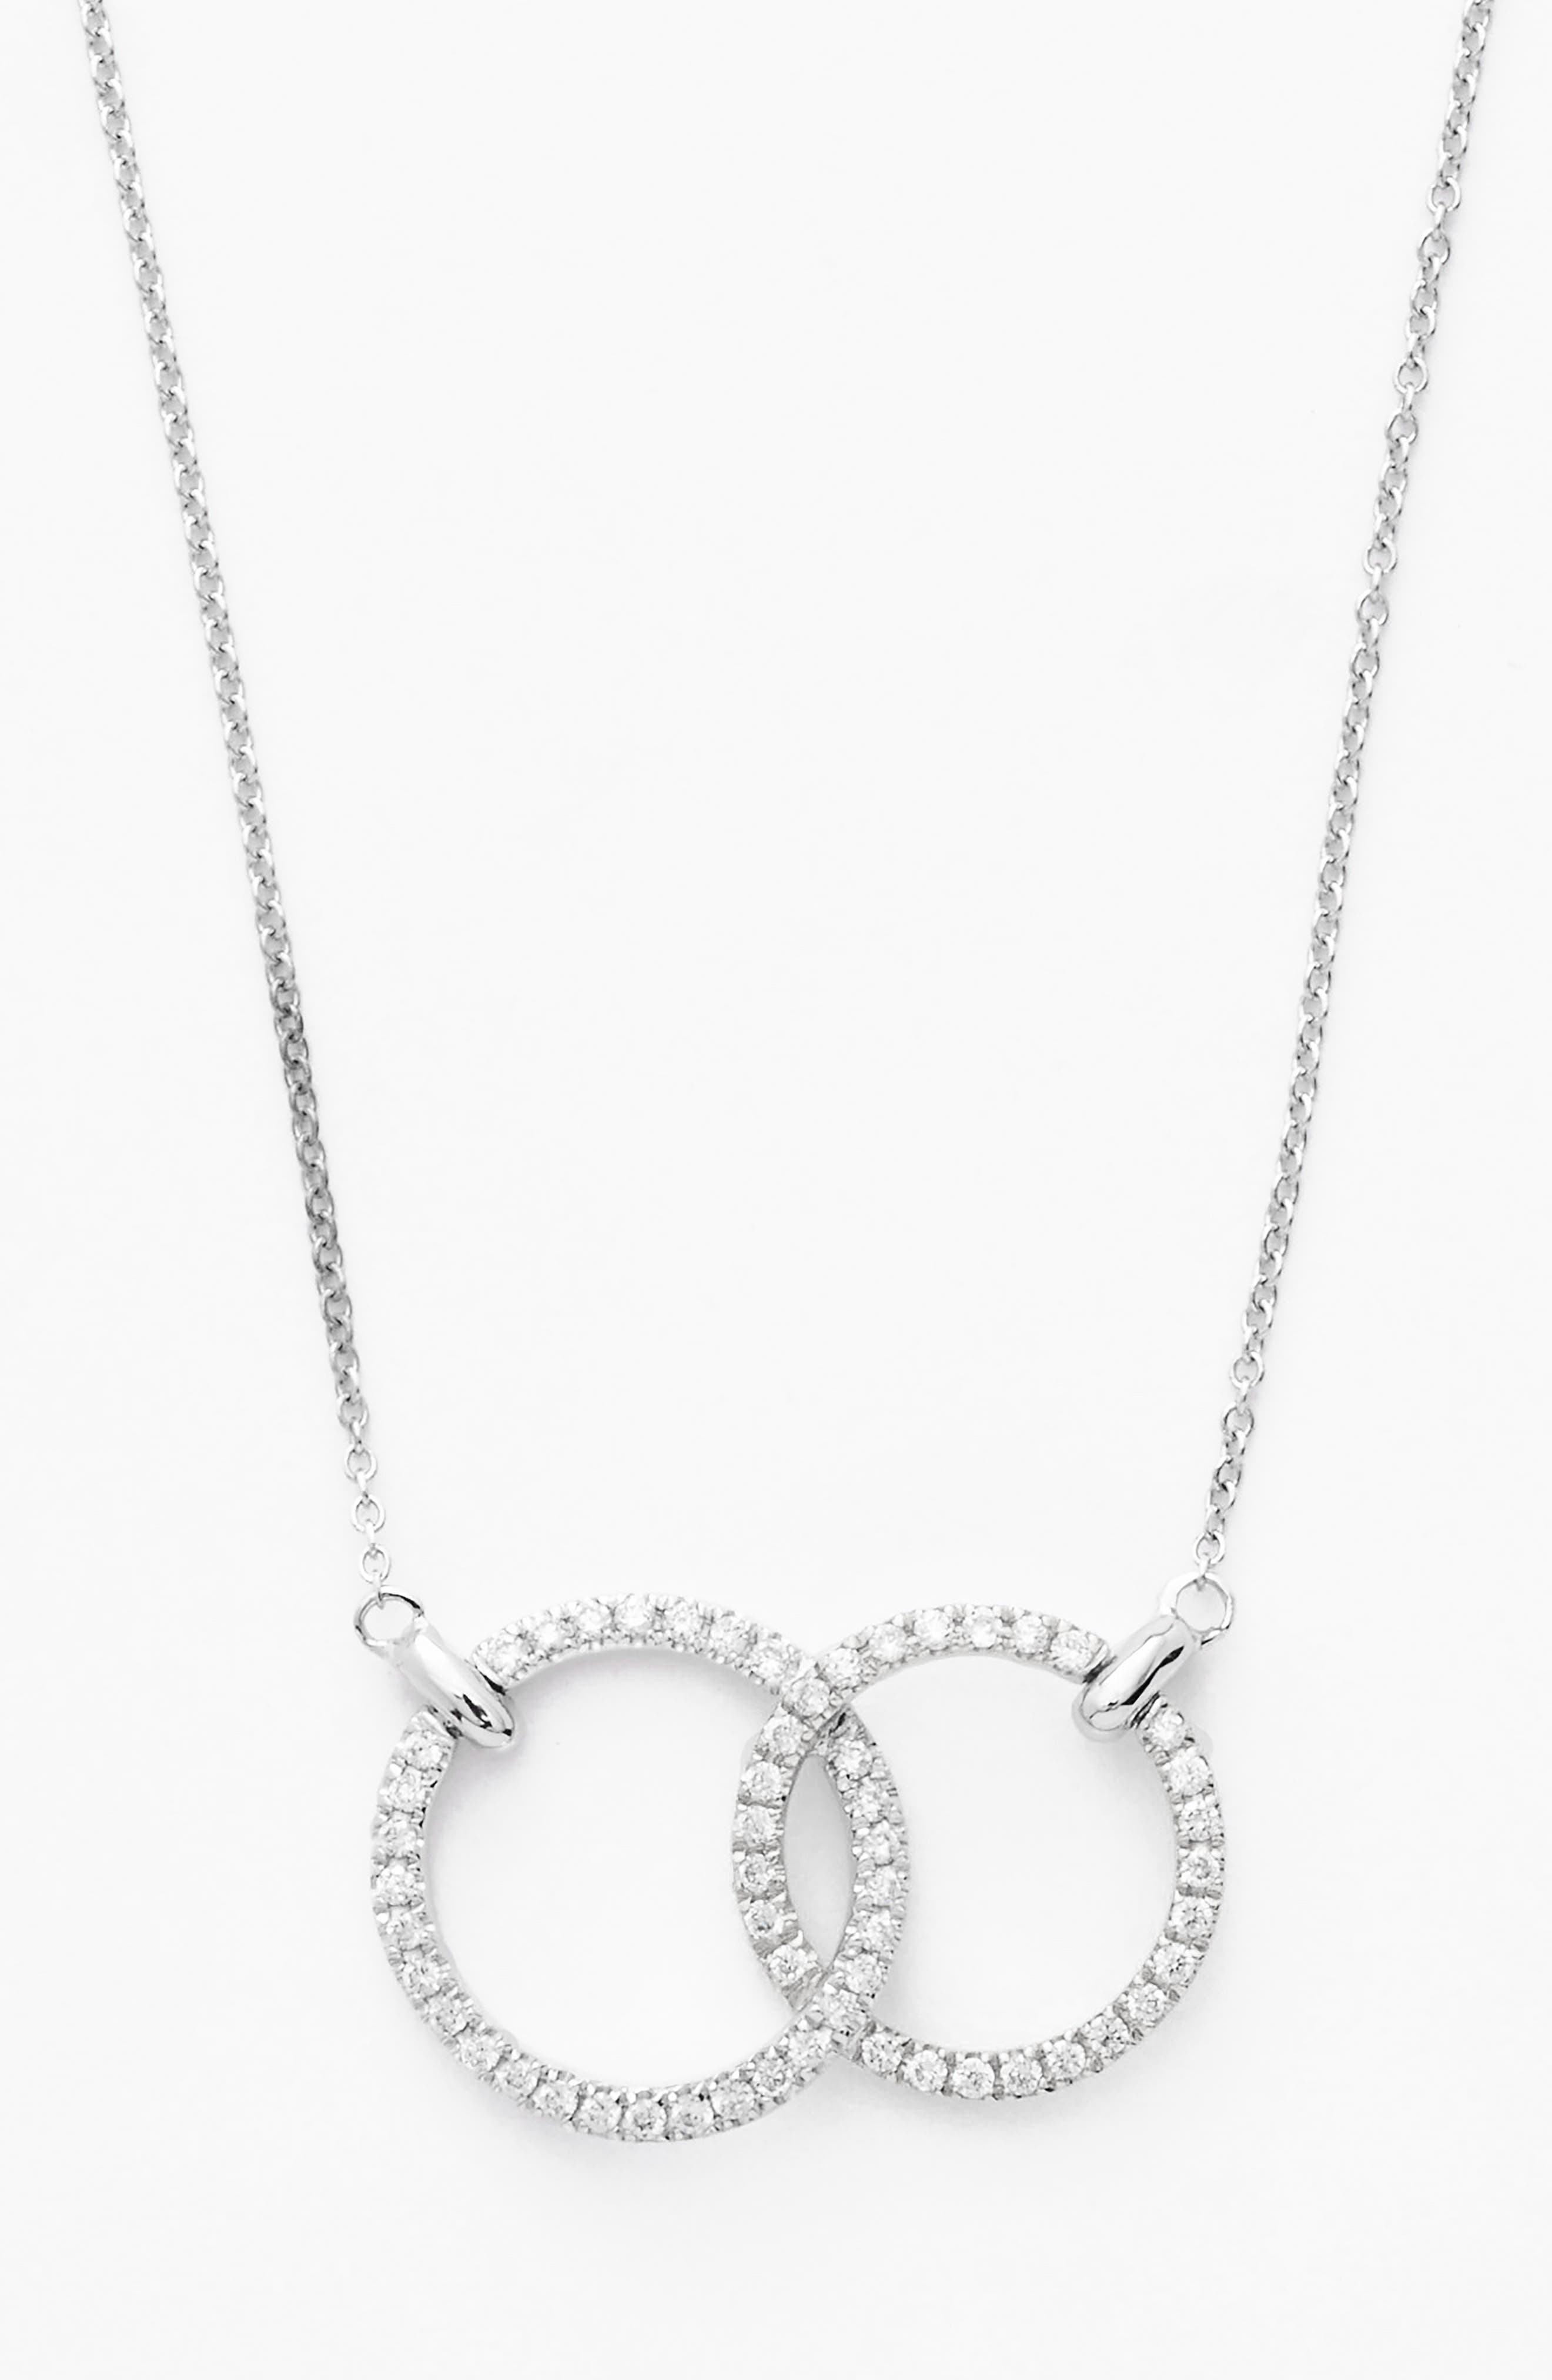 Double Diamond Circle Pendant Necklace,                             Alternate thumbnail 2, color,                             WHITE GOLD